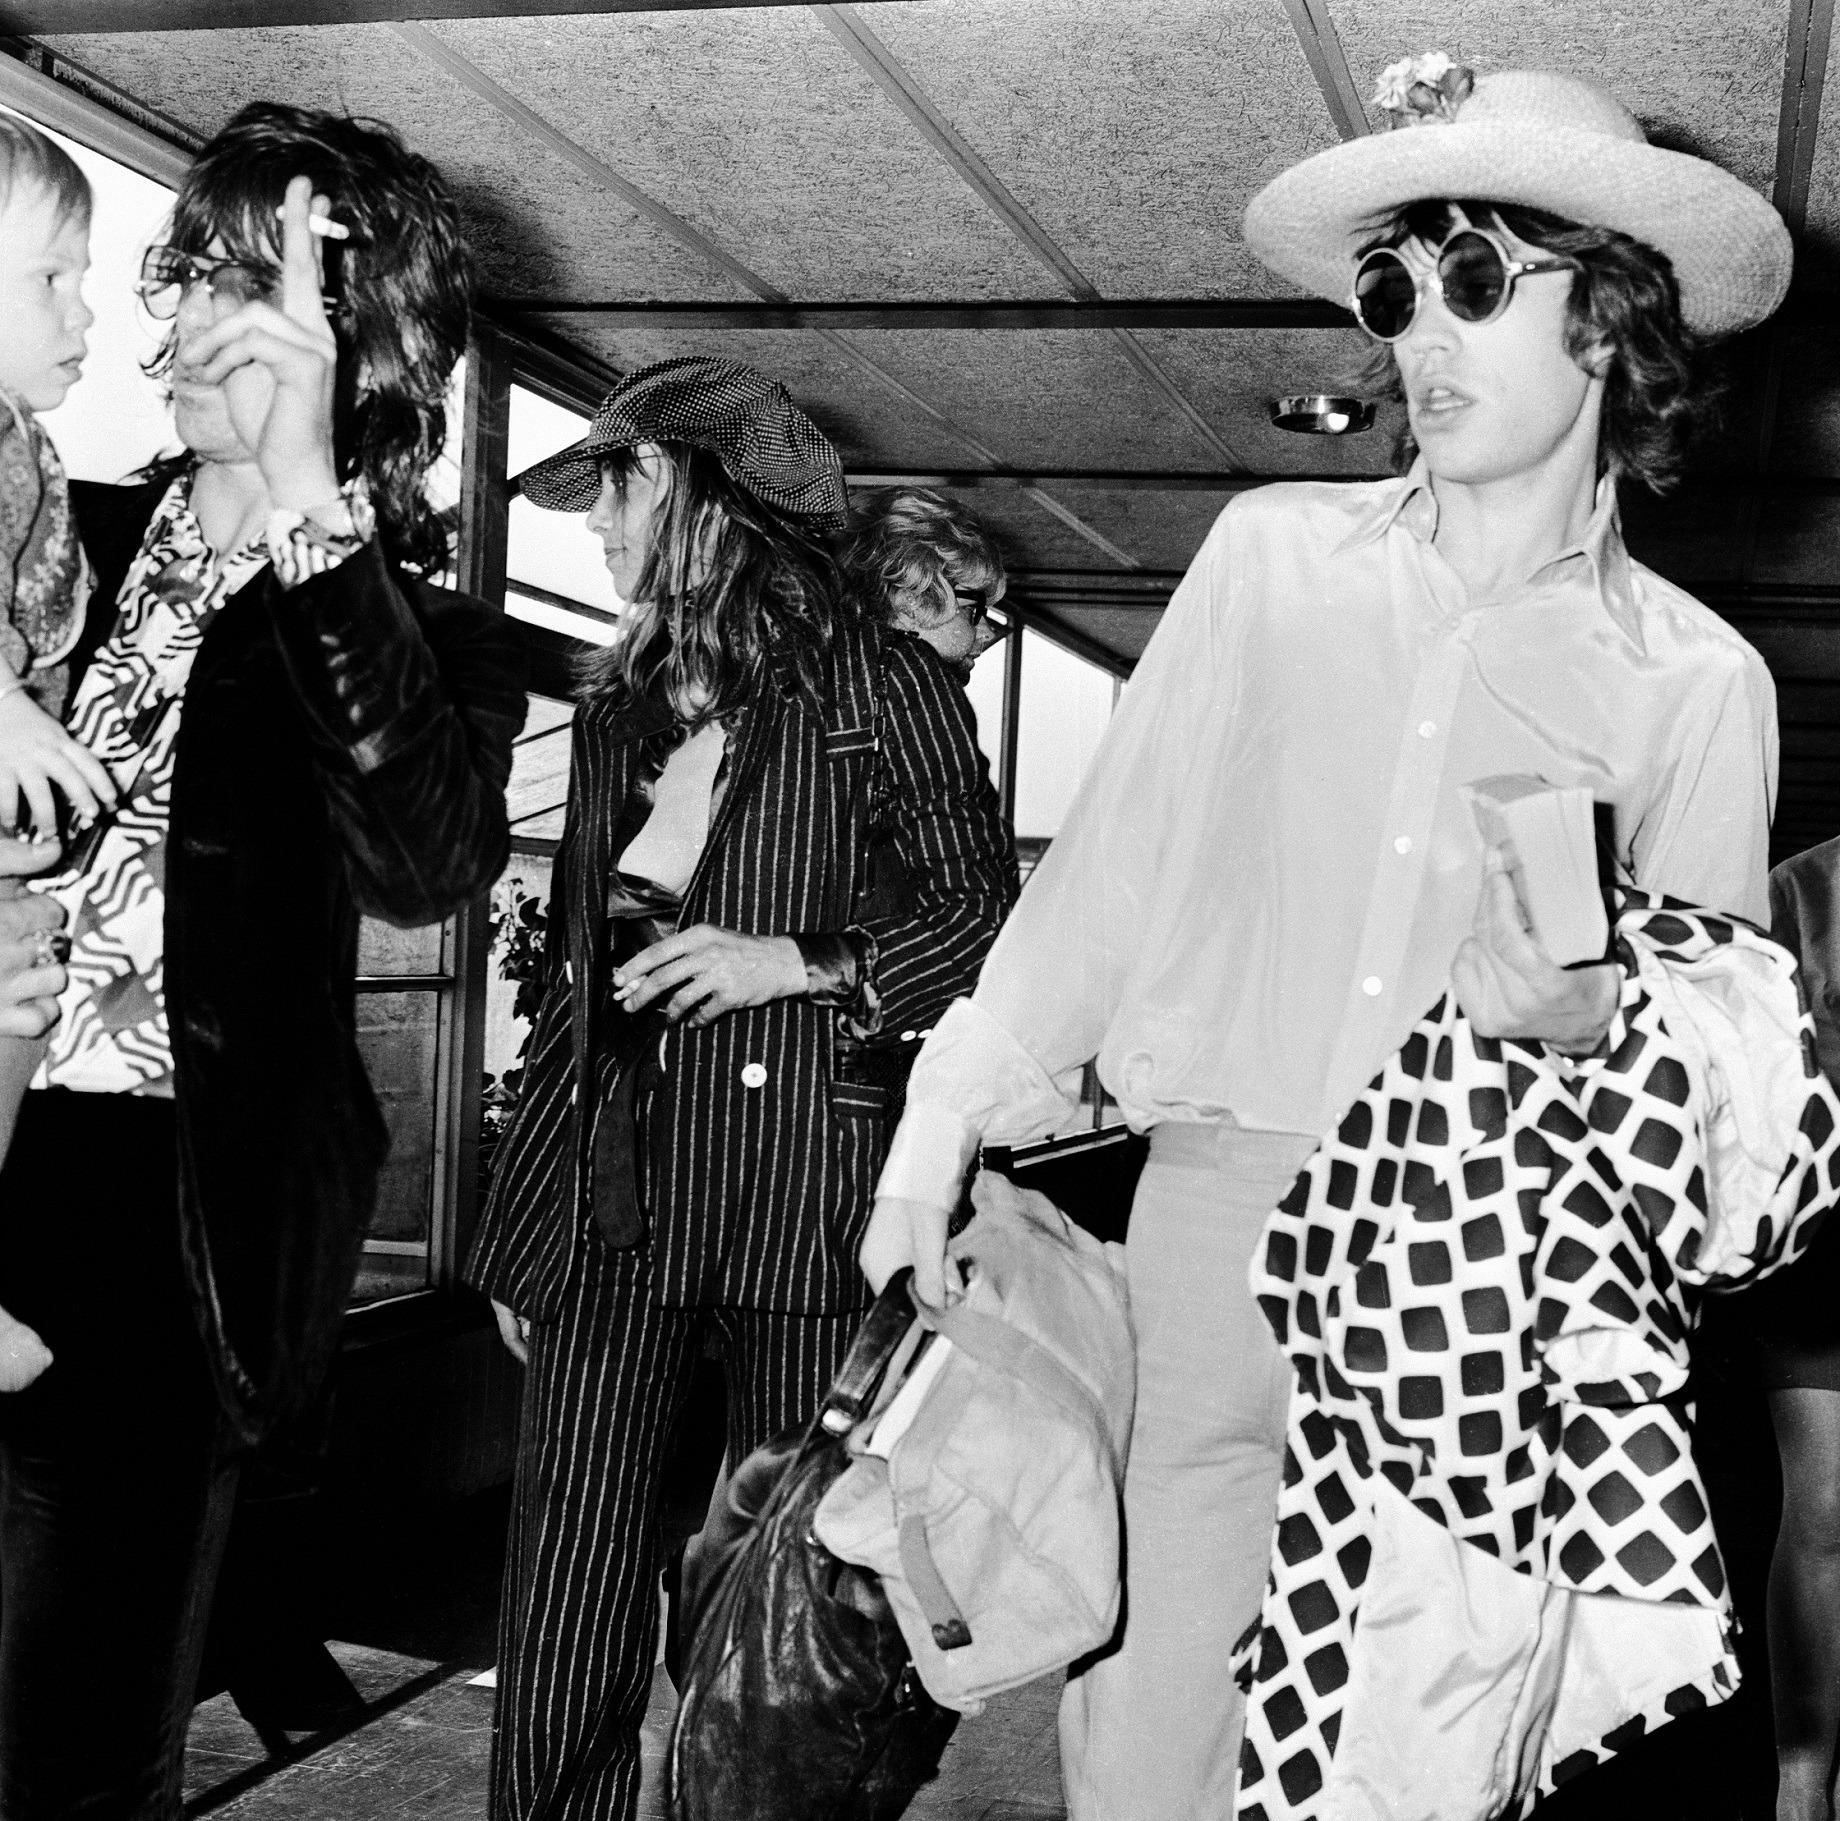 Mick Jagger in 1970